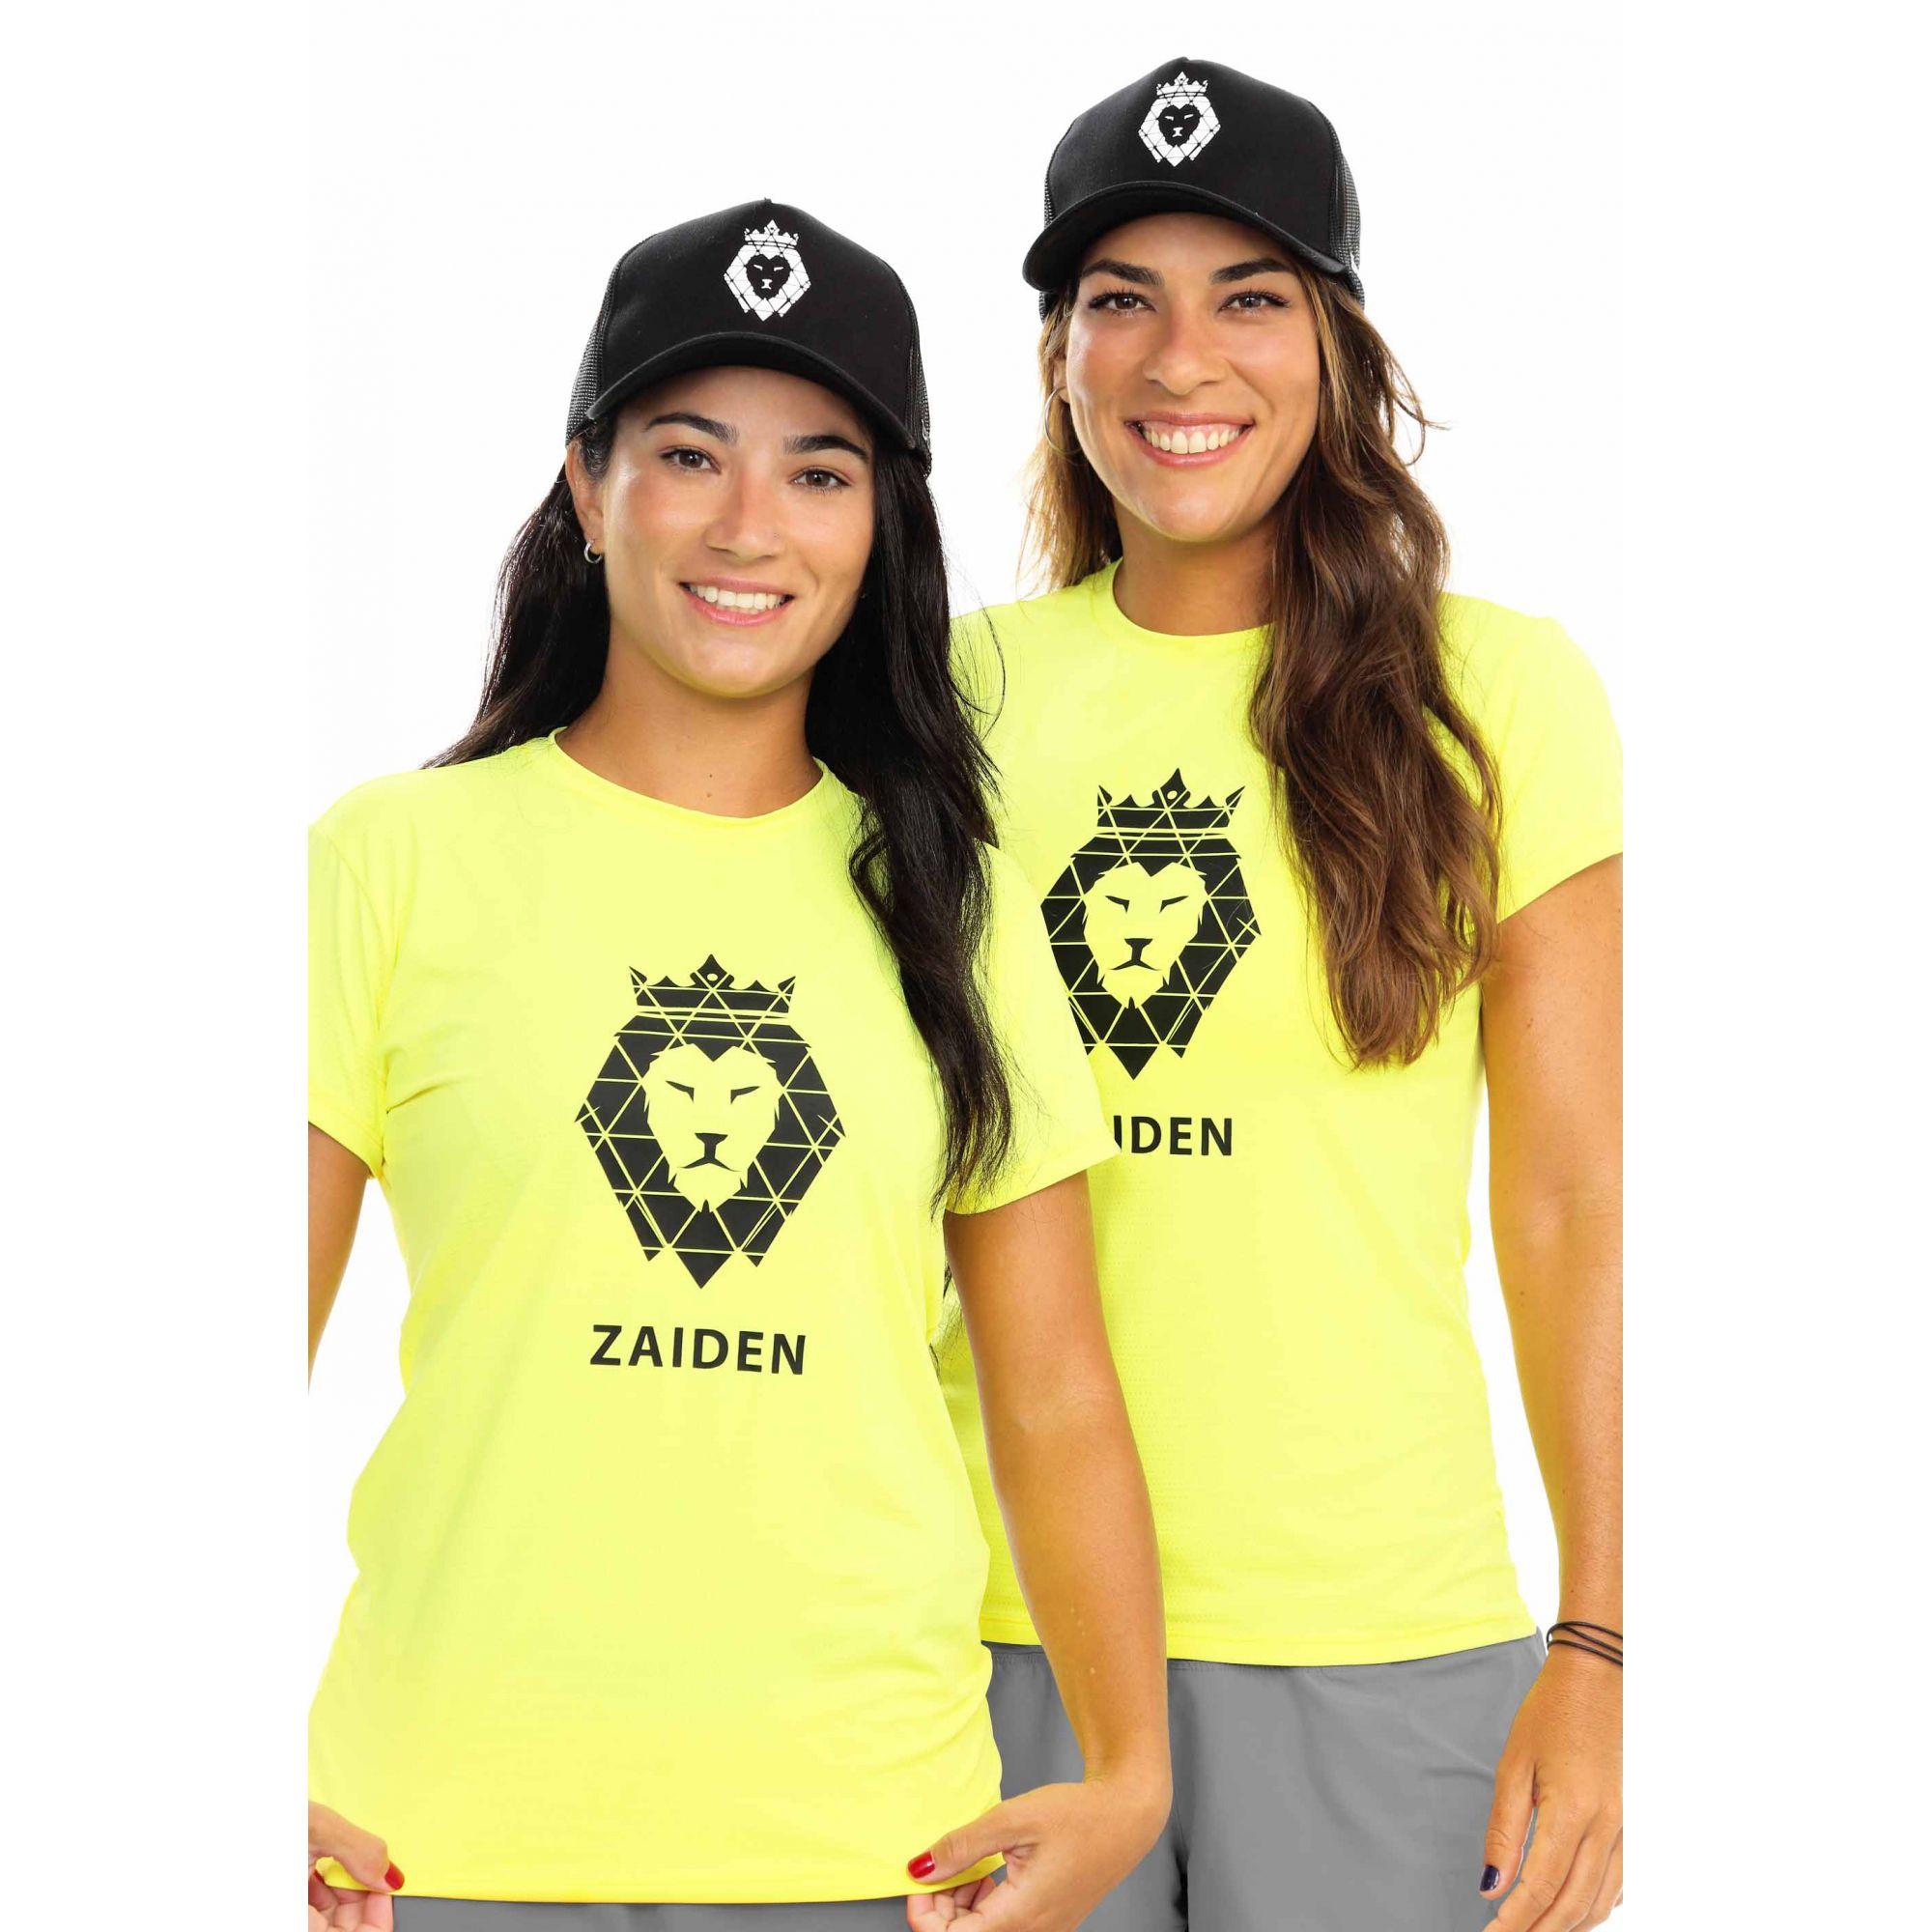 Camiseta Feminina Poliamida ZAIDEN Isla Leão Preto